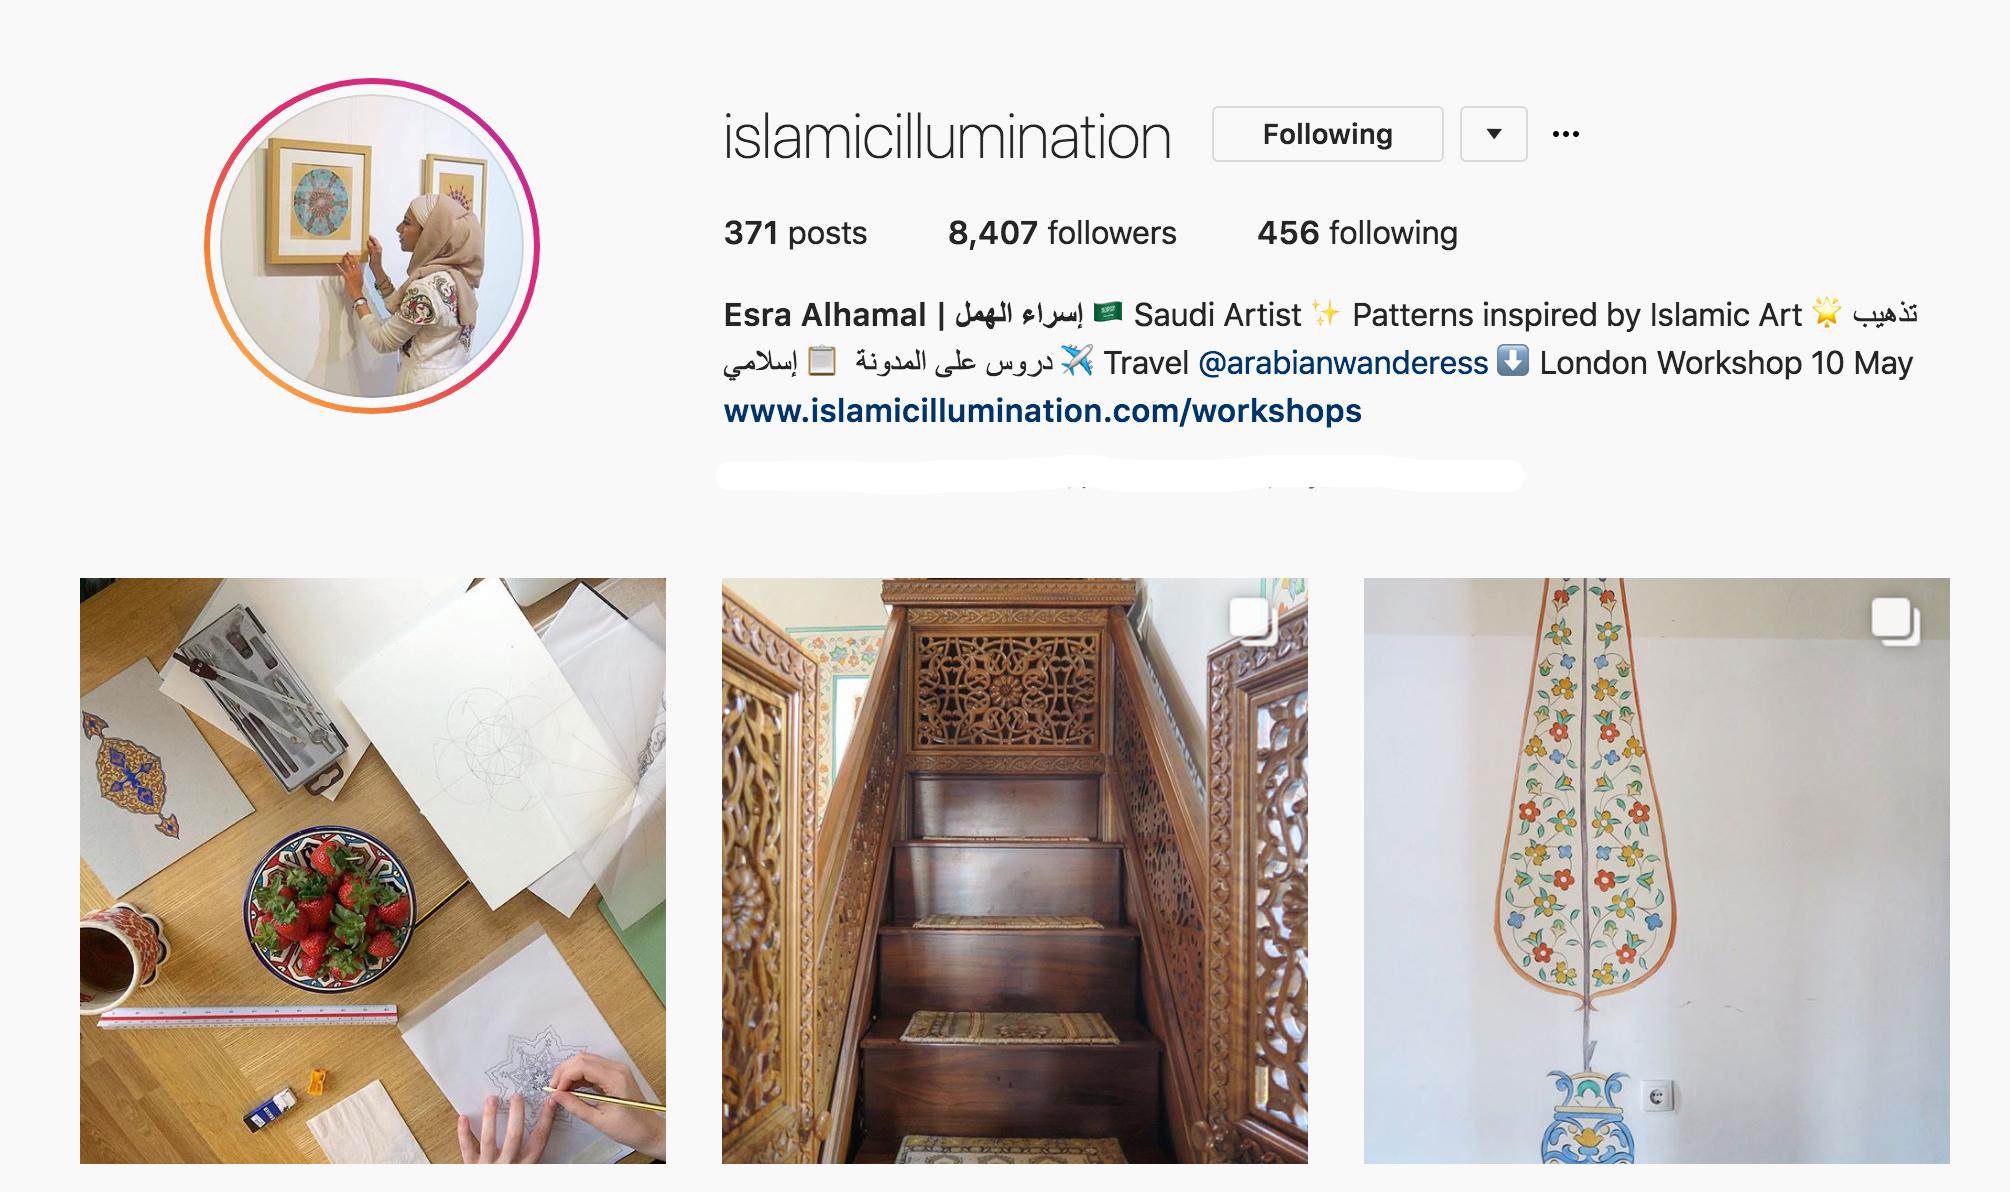 Islamic Art Islamic Illumination Instagram